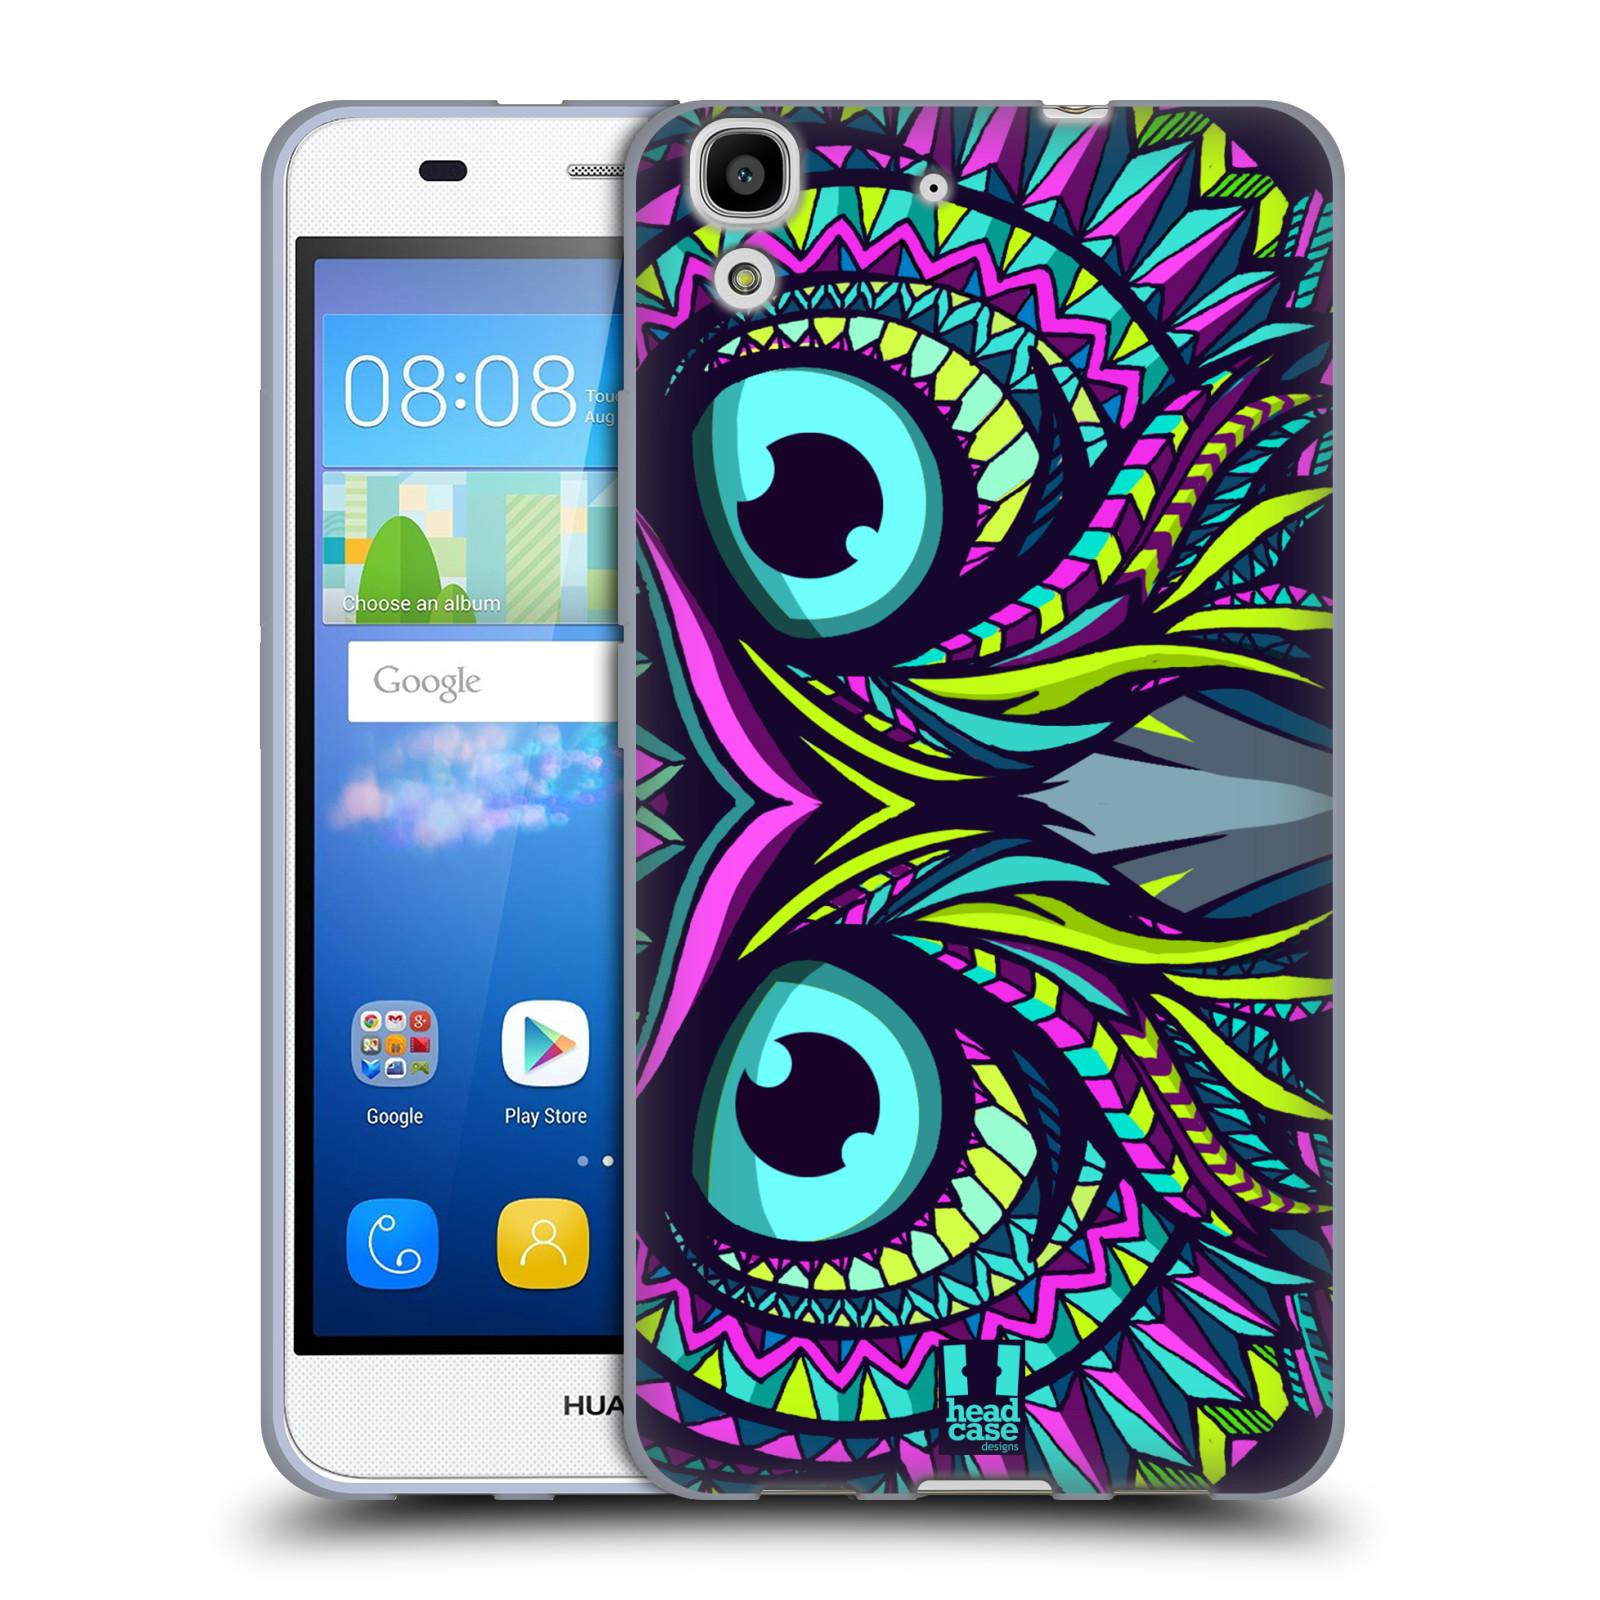 Silikonové pouzdro na mobil Huawei Y6 HEAD CASE AZTEC SOVA